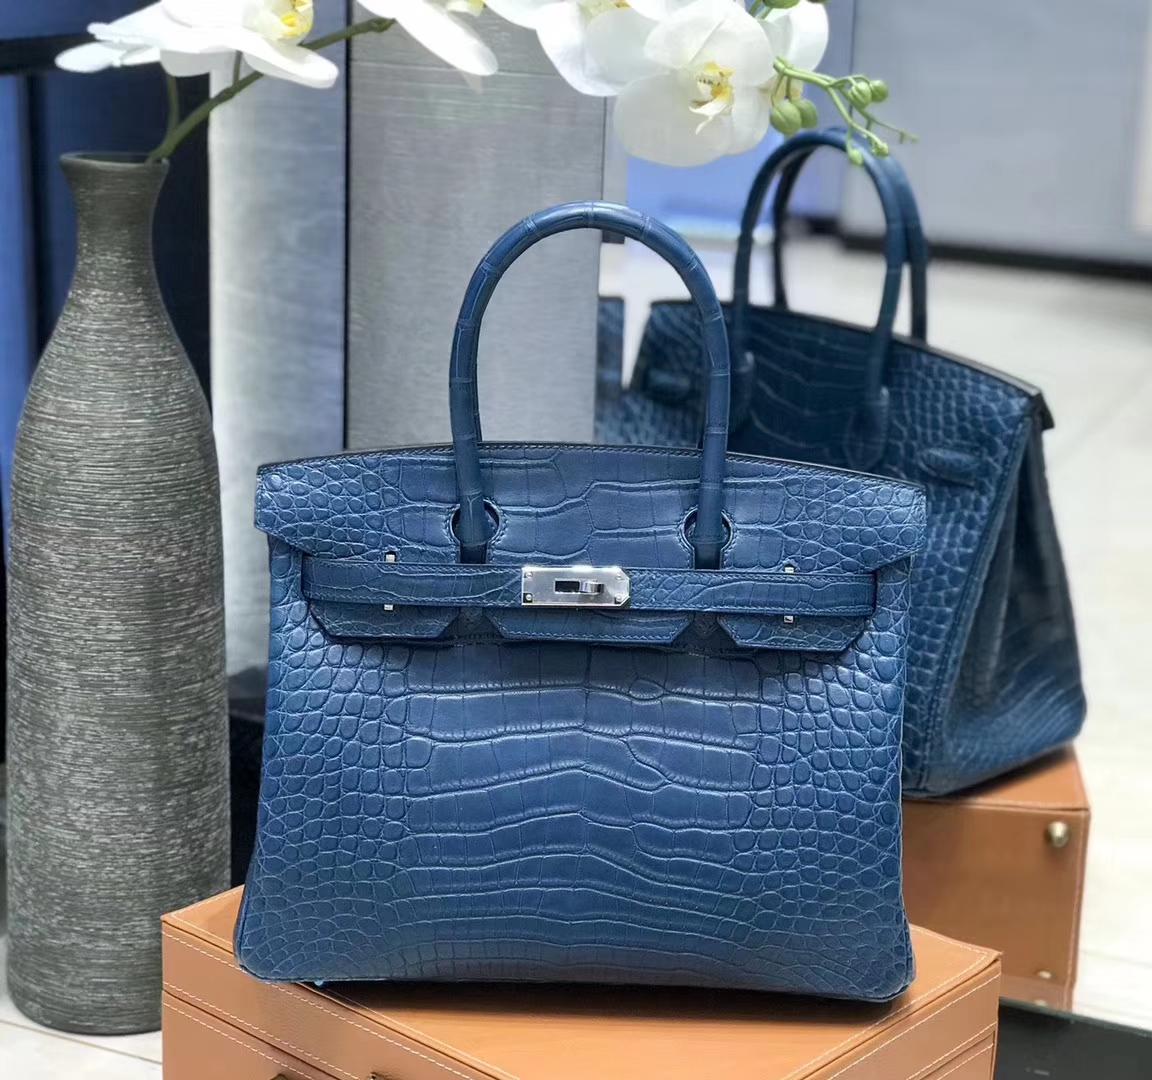 Hermès(爱马仕) Birkin铂金包 靛蓝色 雾面美洲鳄鱼皮 银扣 30cm